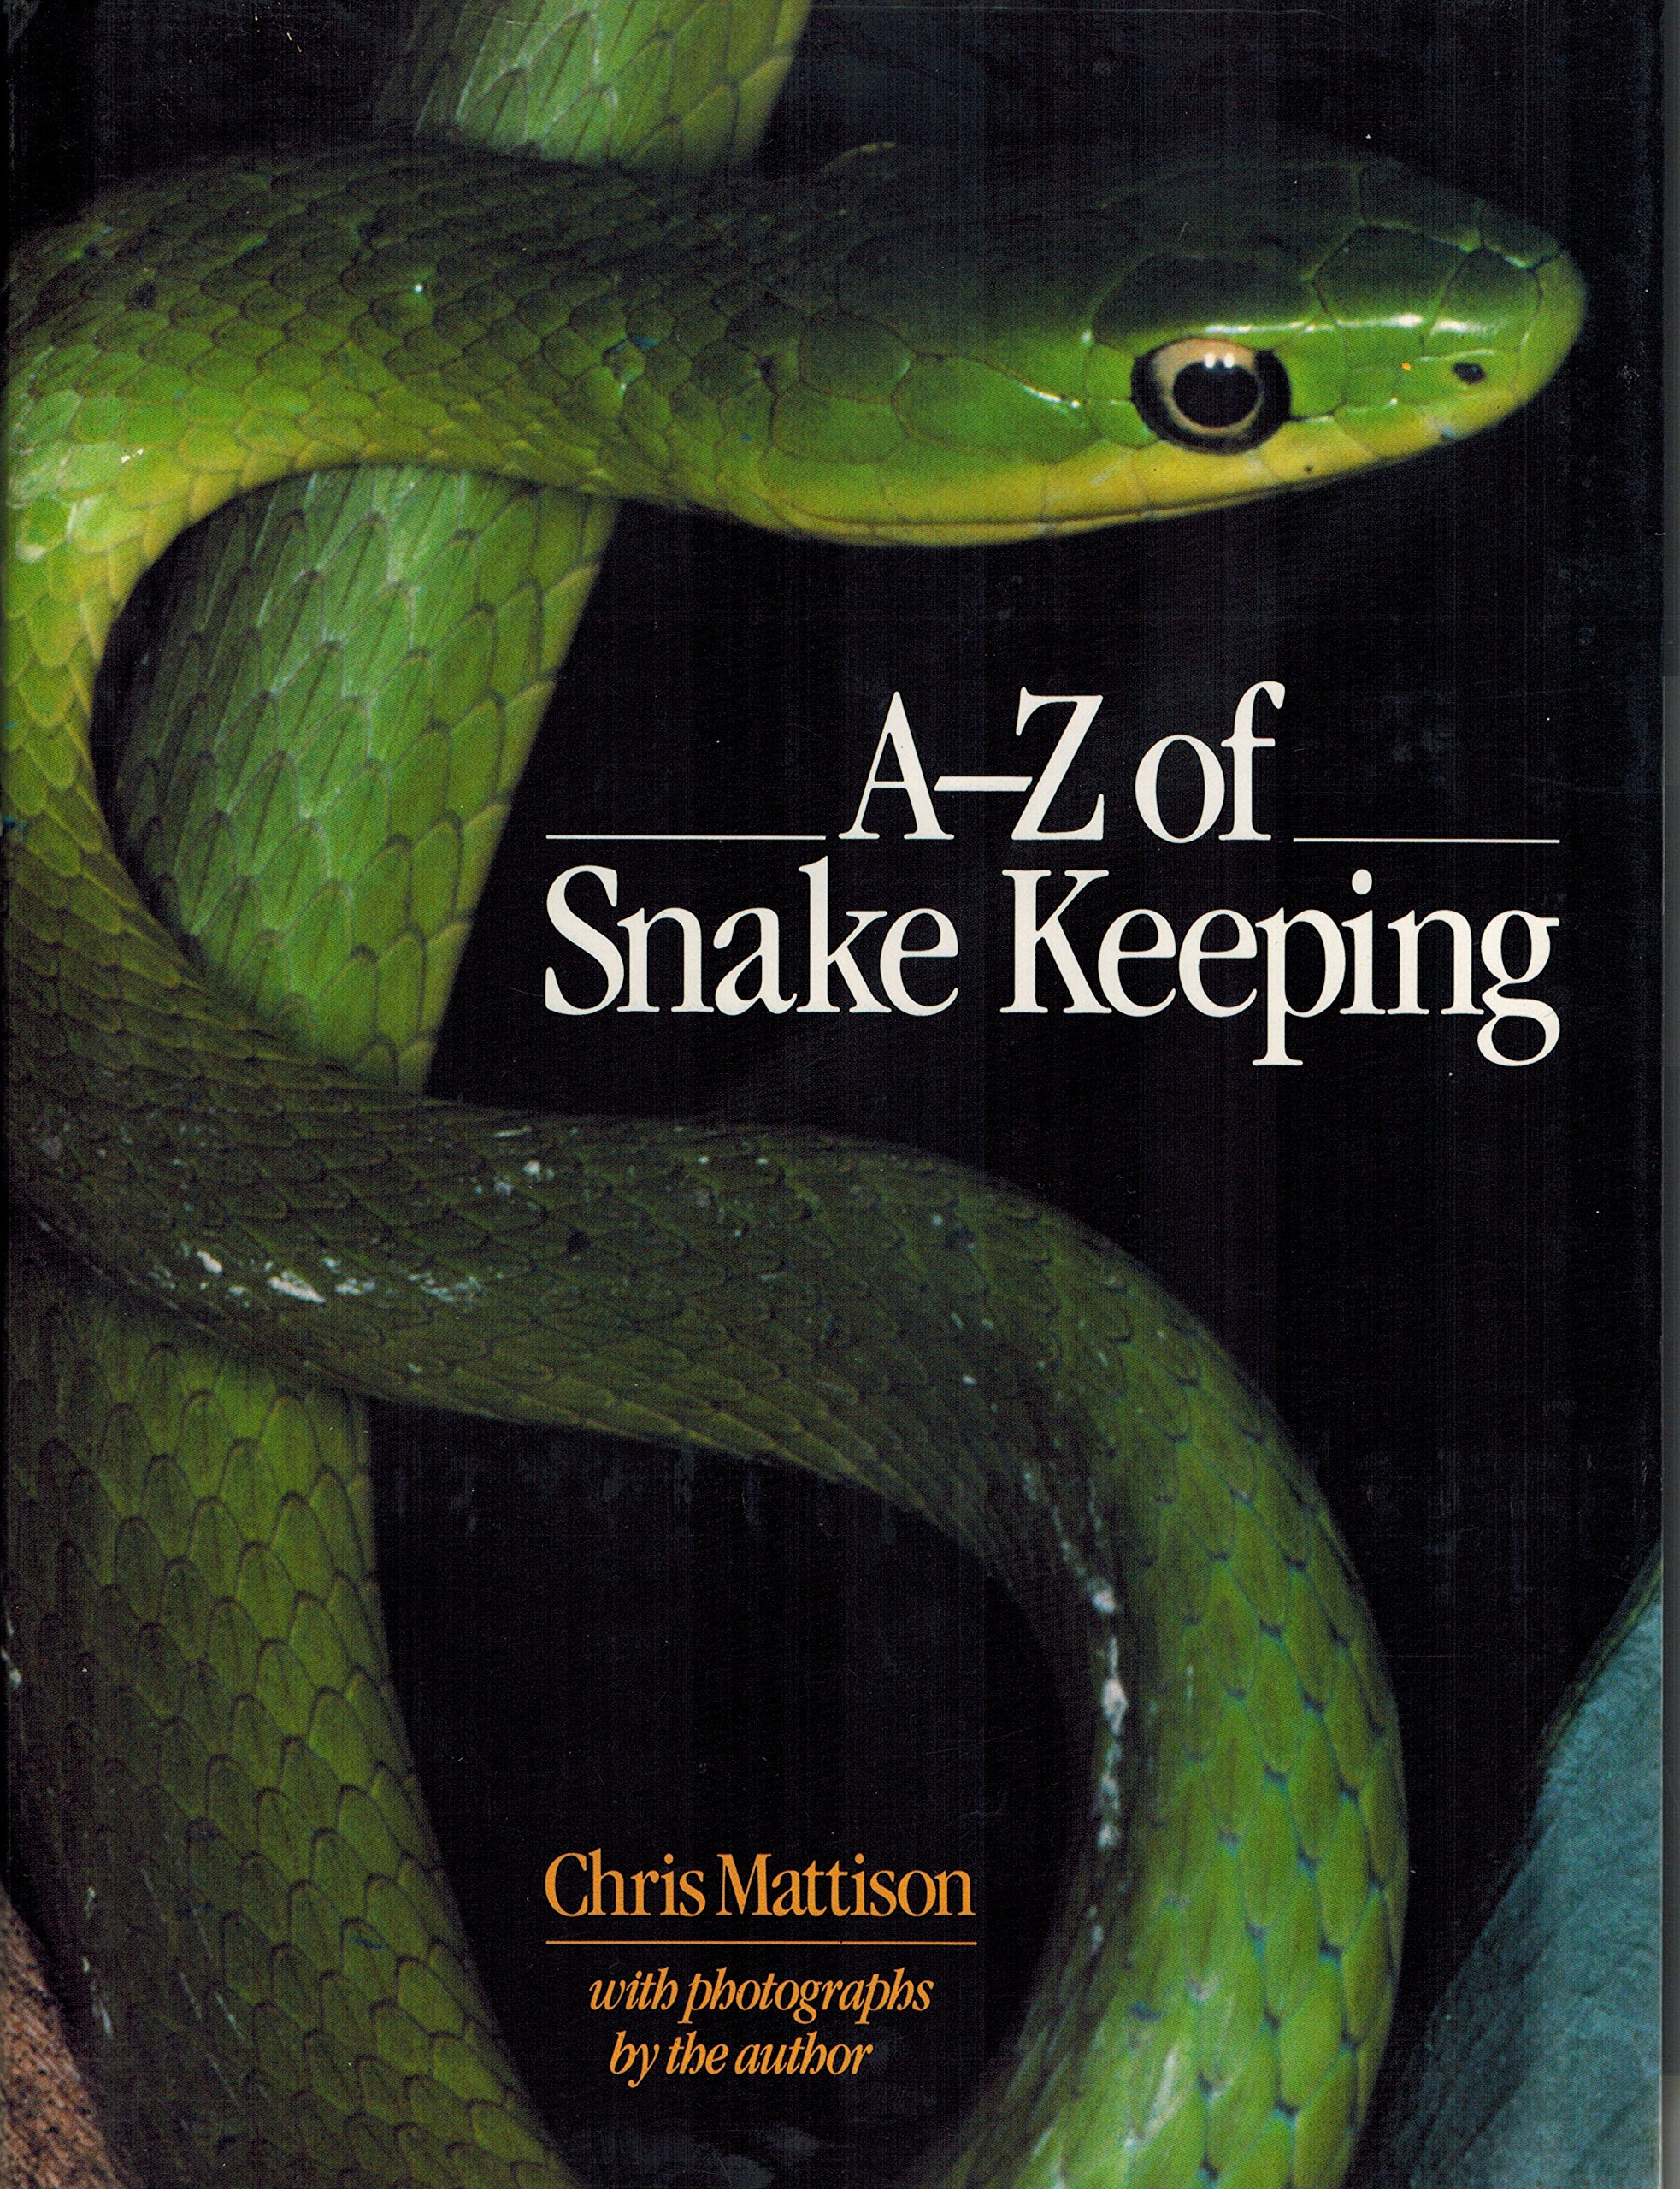 A-Z of snake keeping